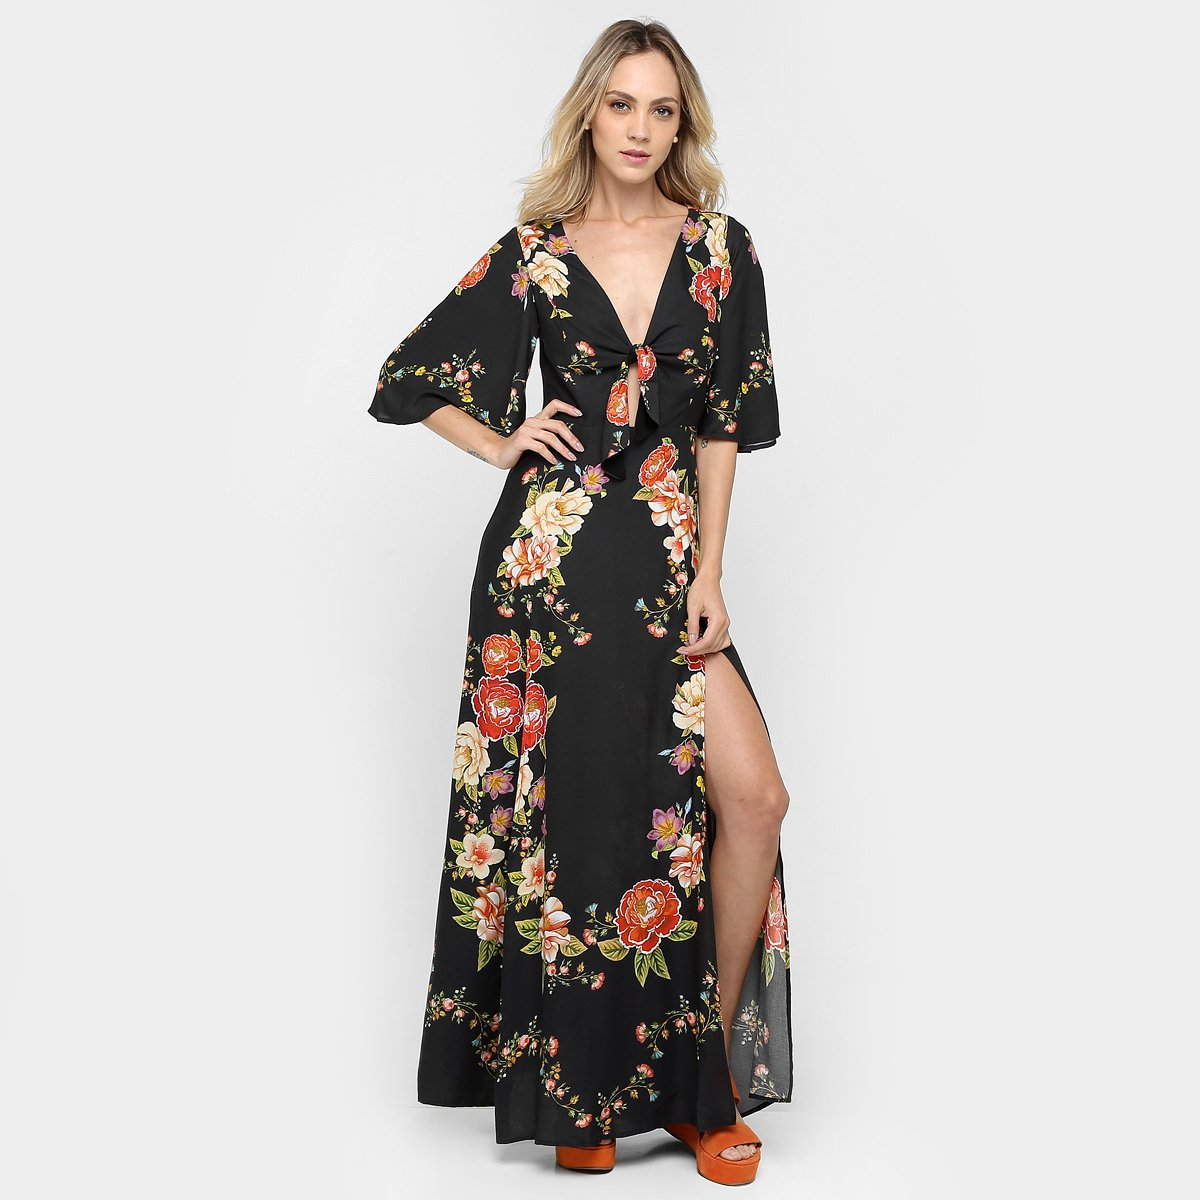 Vestido sommer longo com fenda